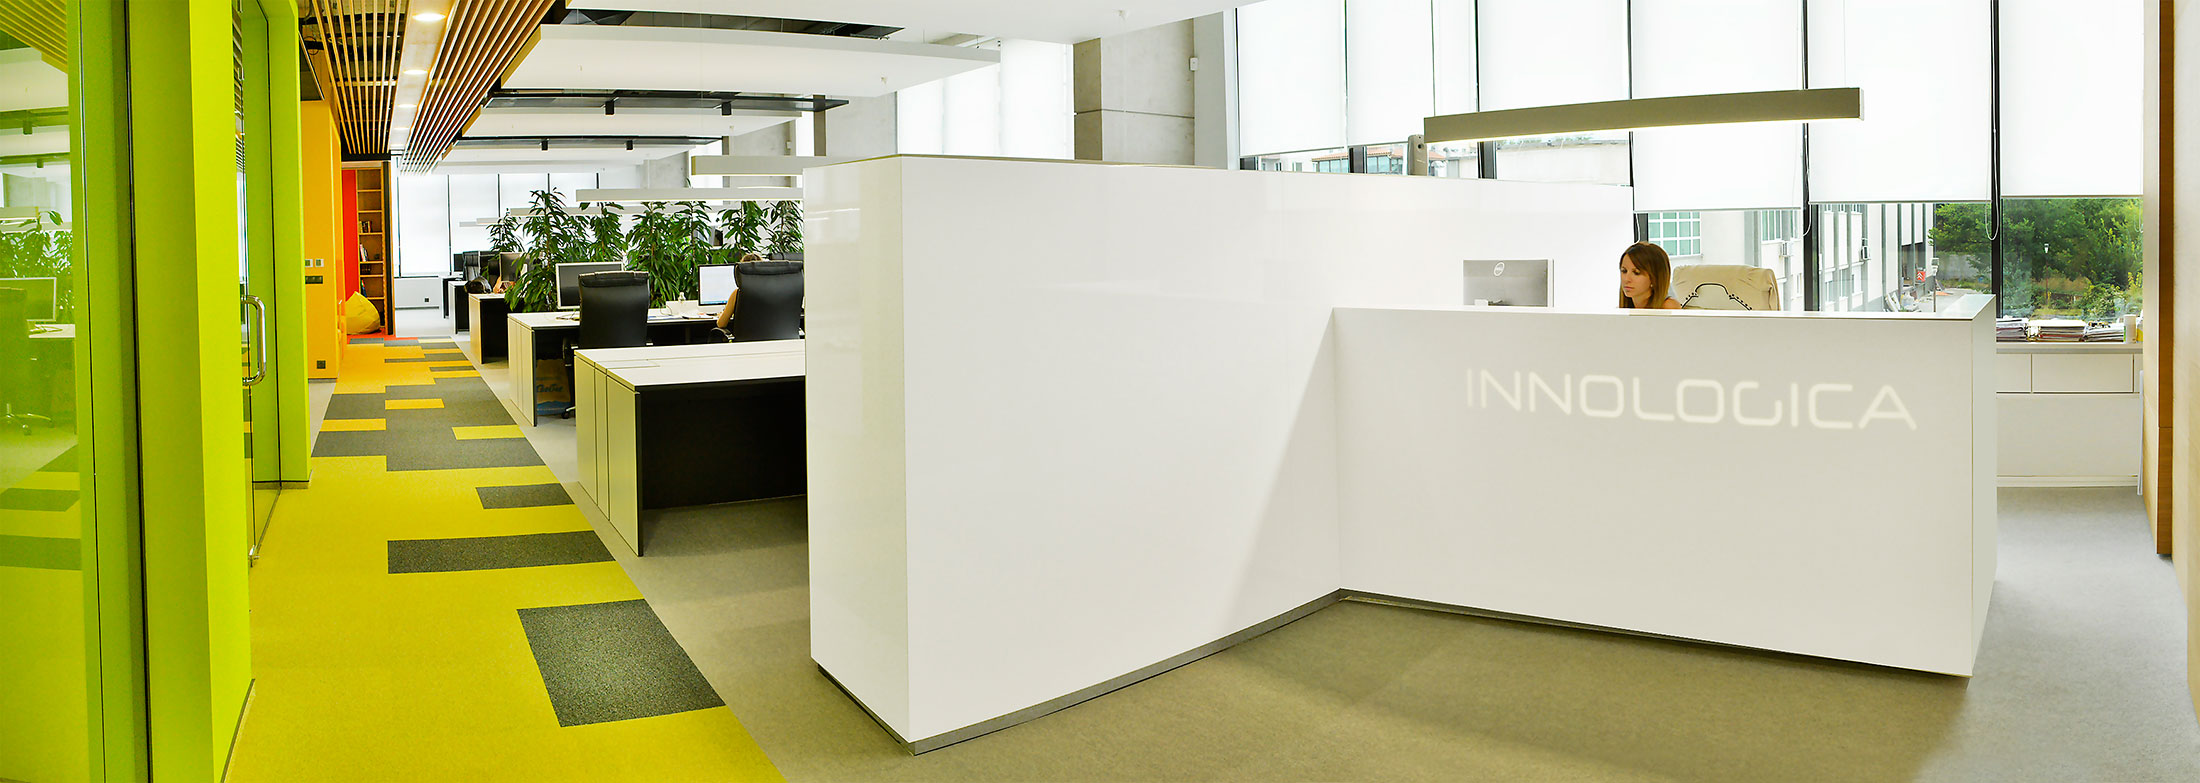 innologica office panorama